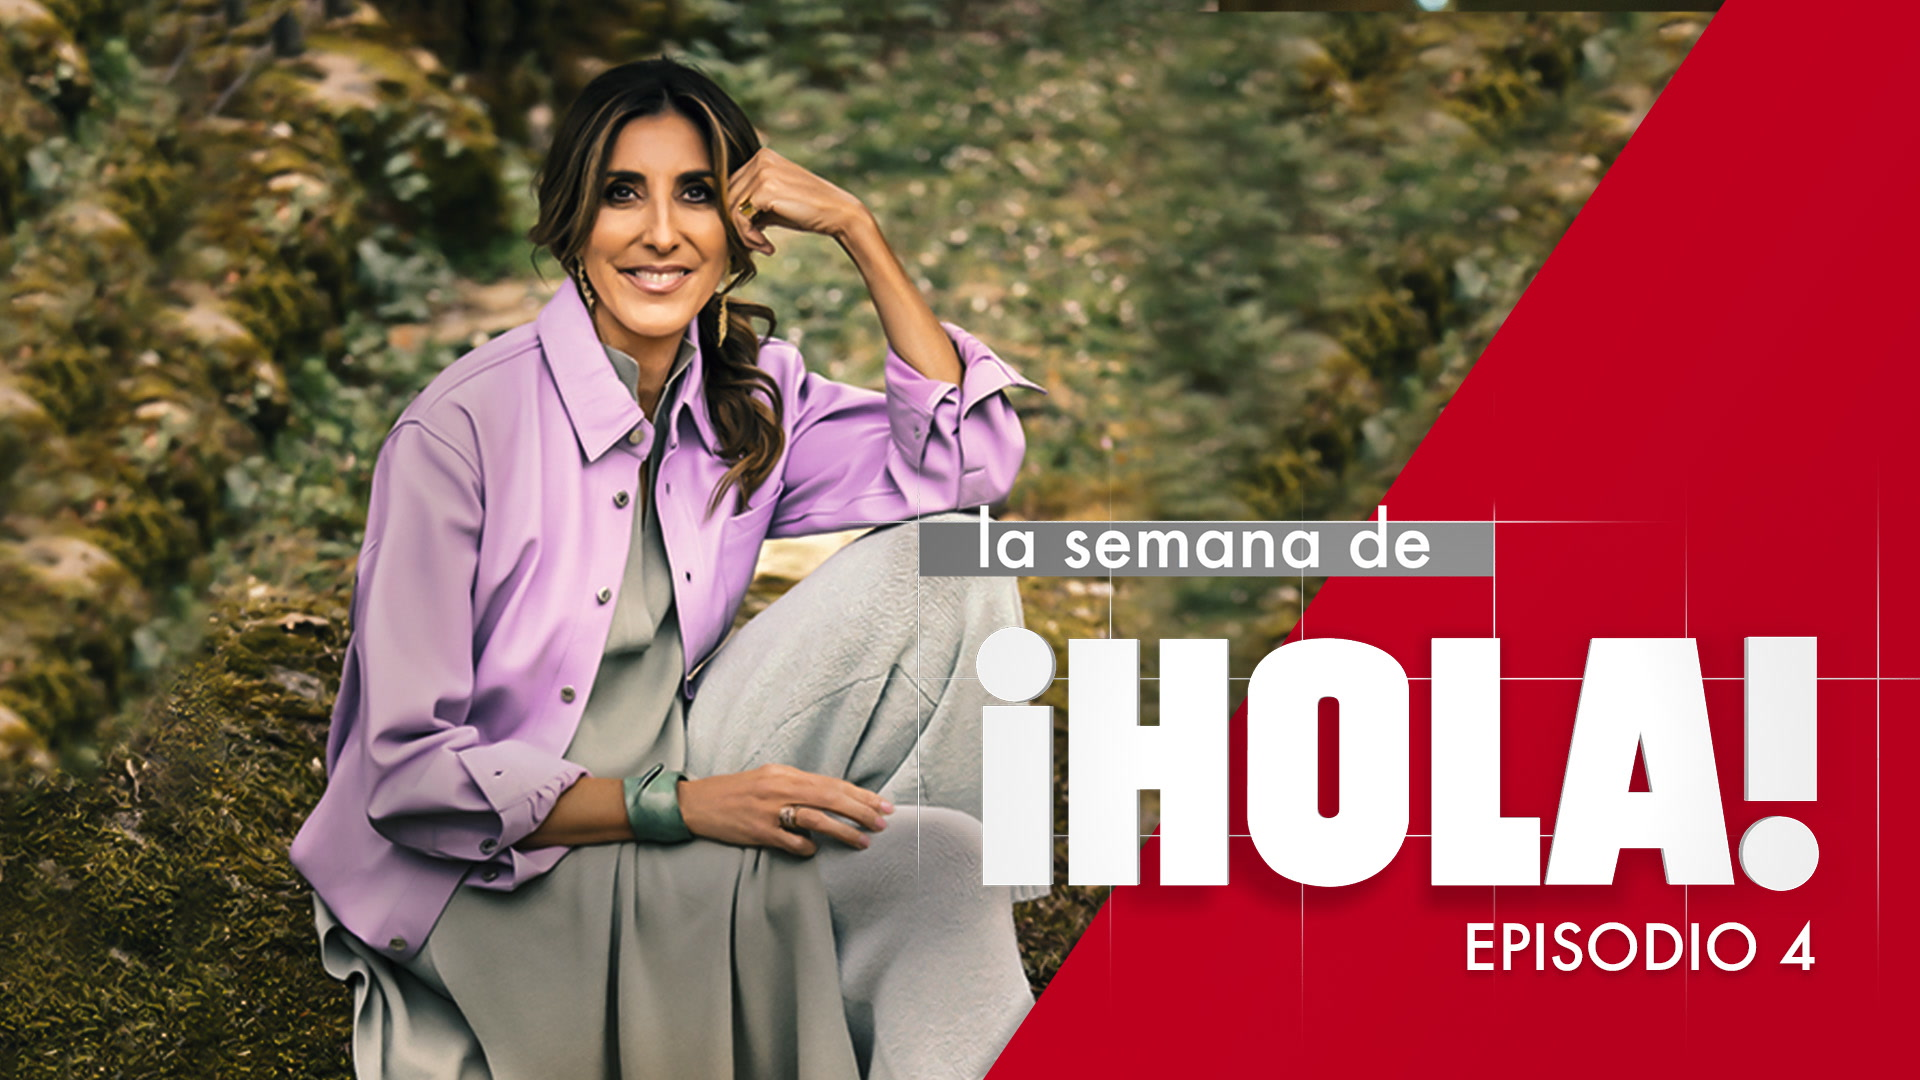 La semana de ¡HOLA! - Episodio 4